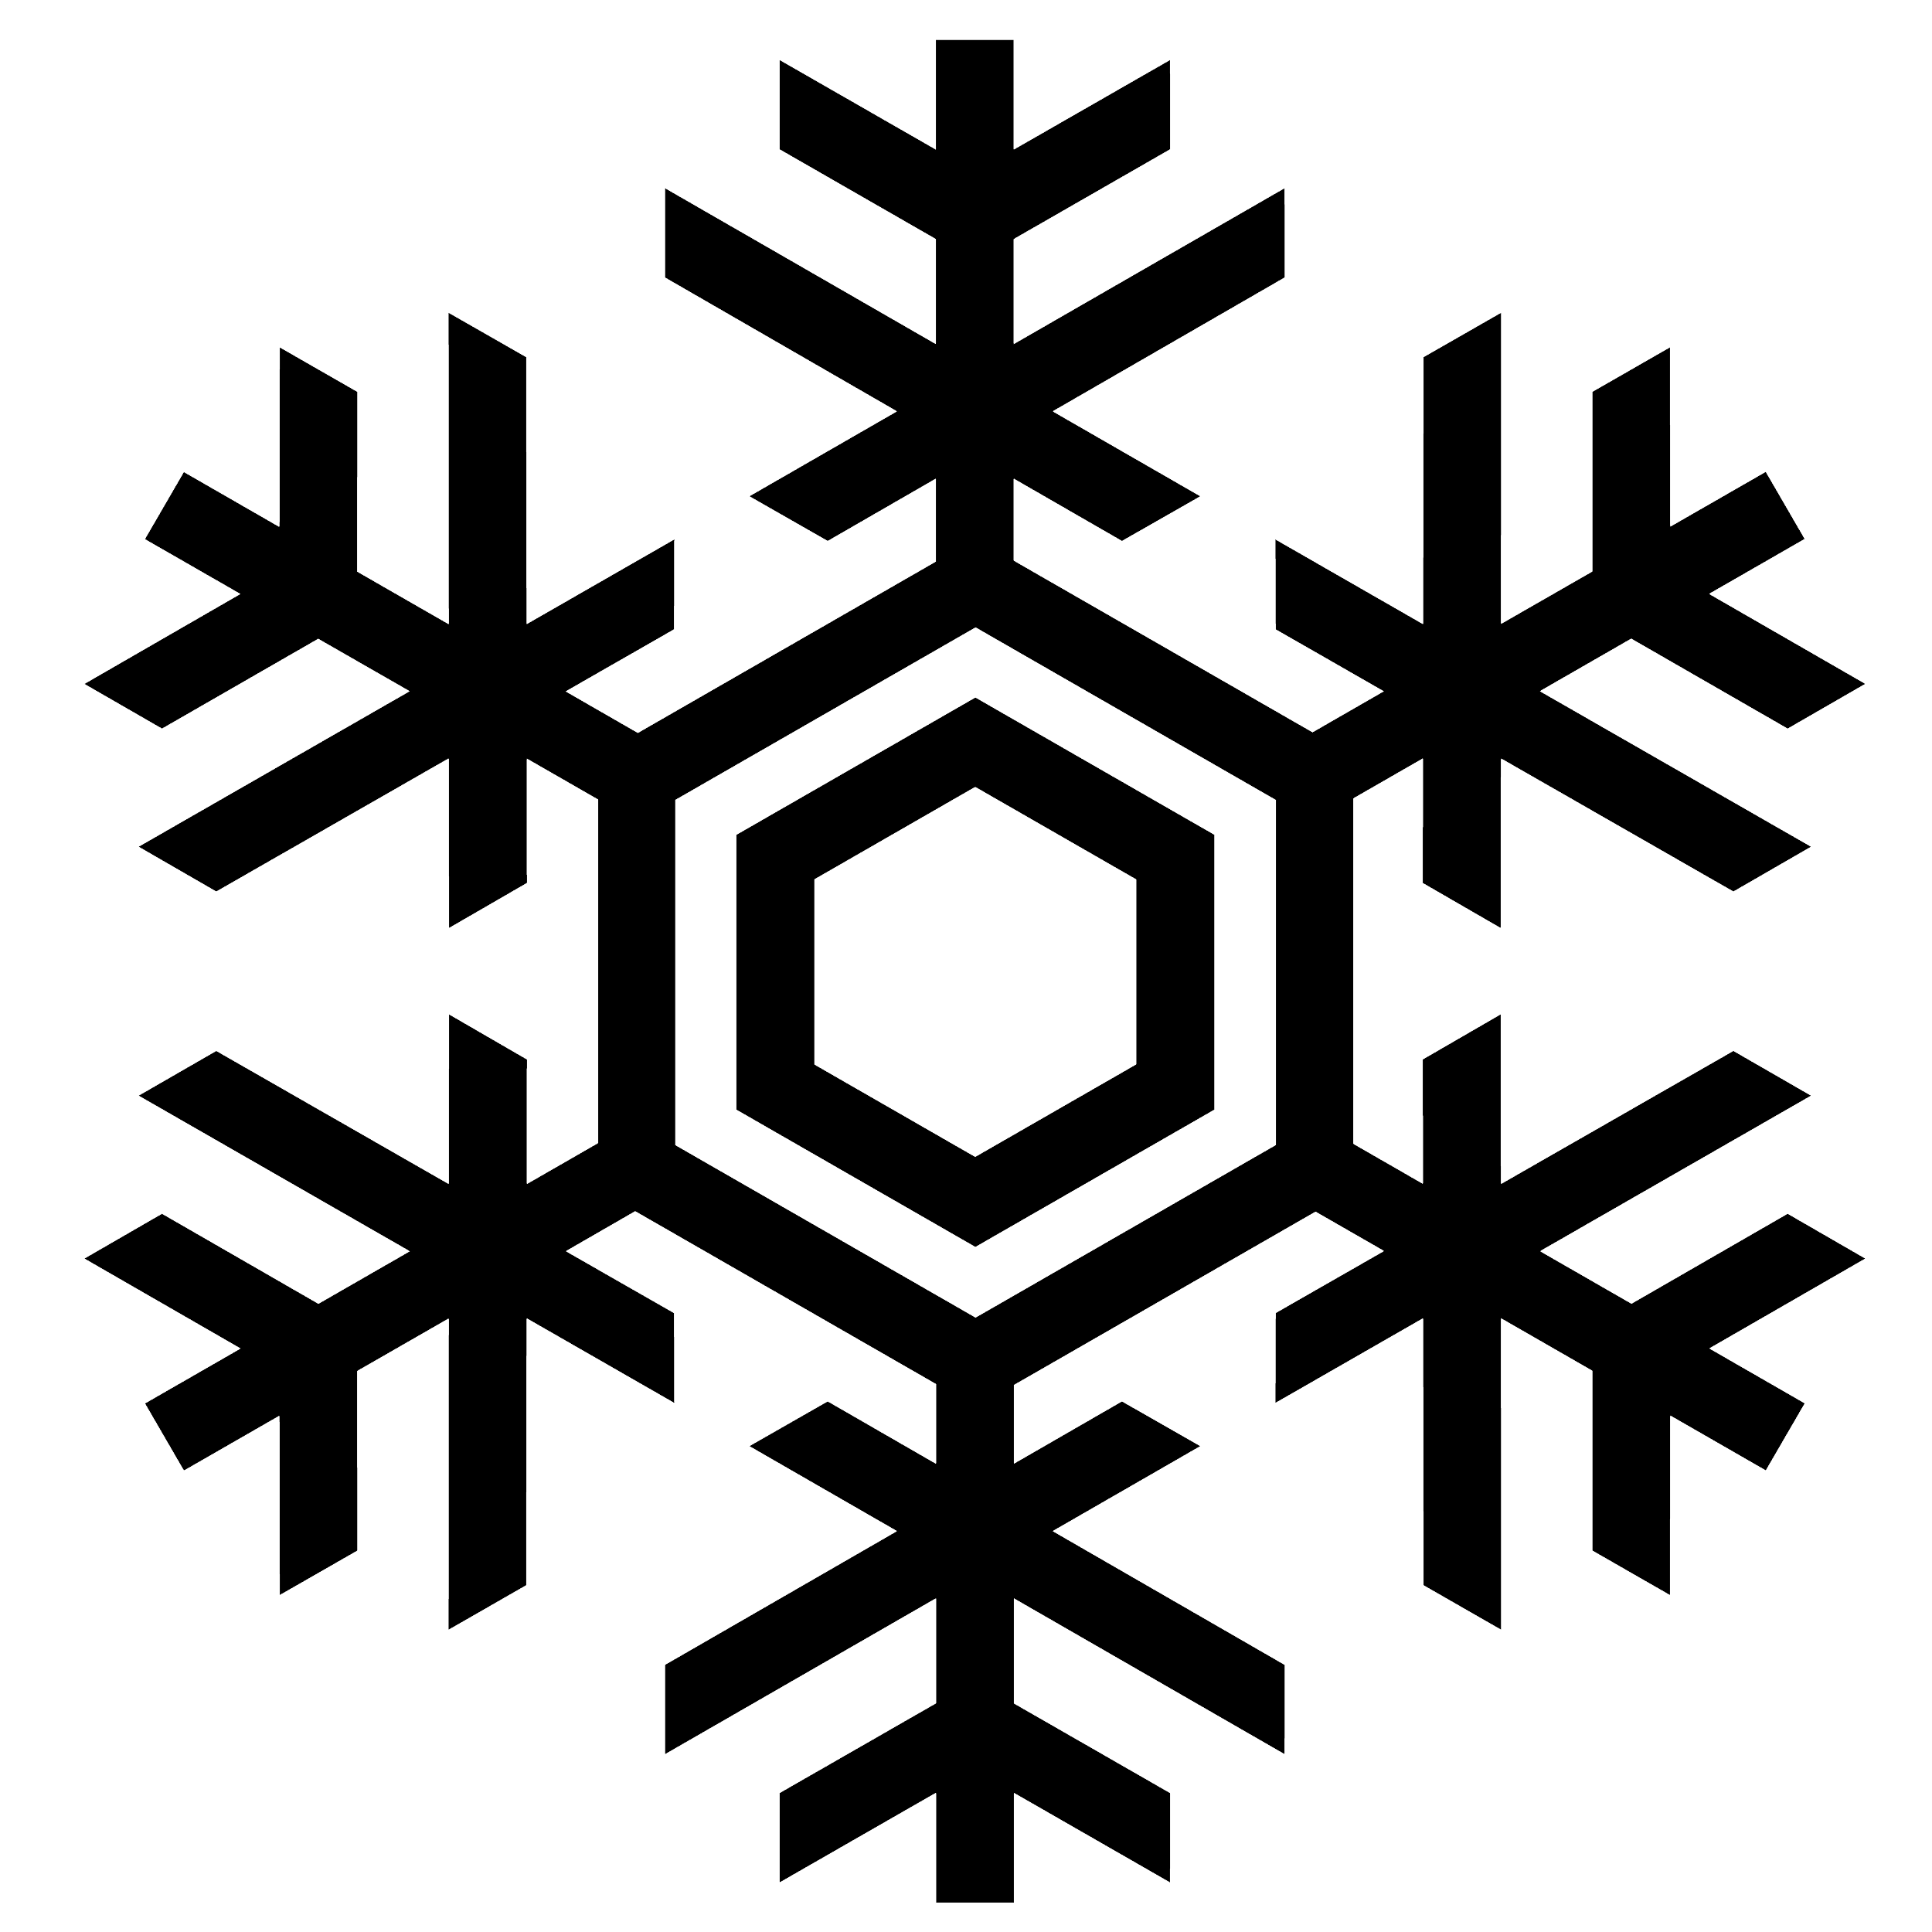 2500x2500 Snowflake Silhouette